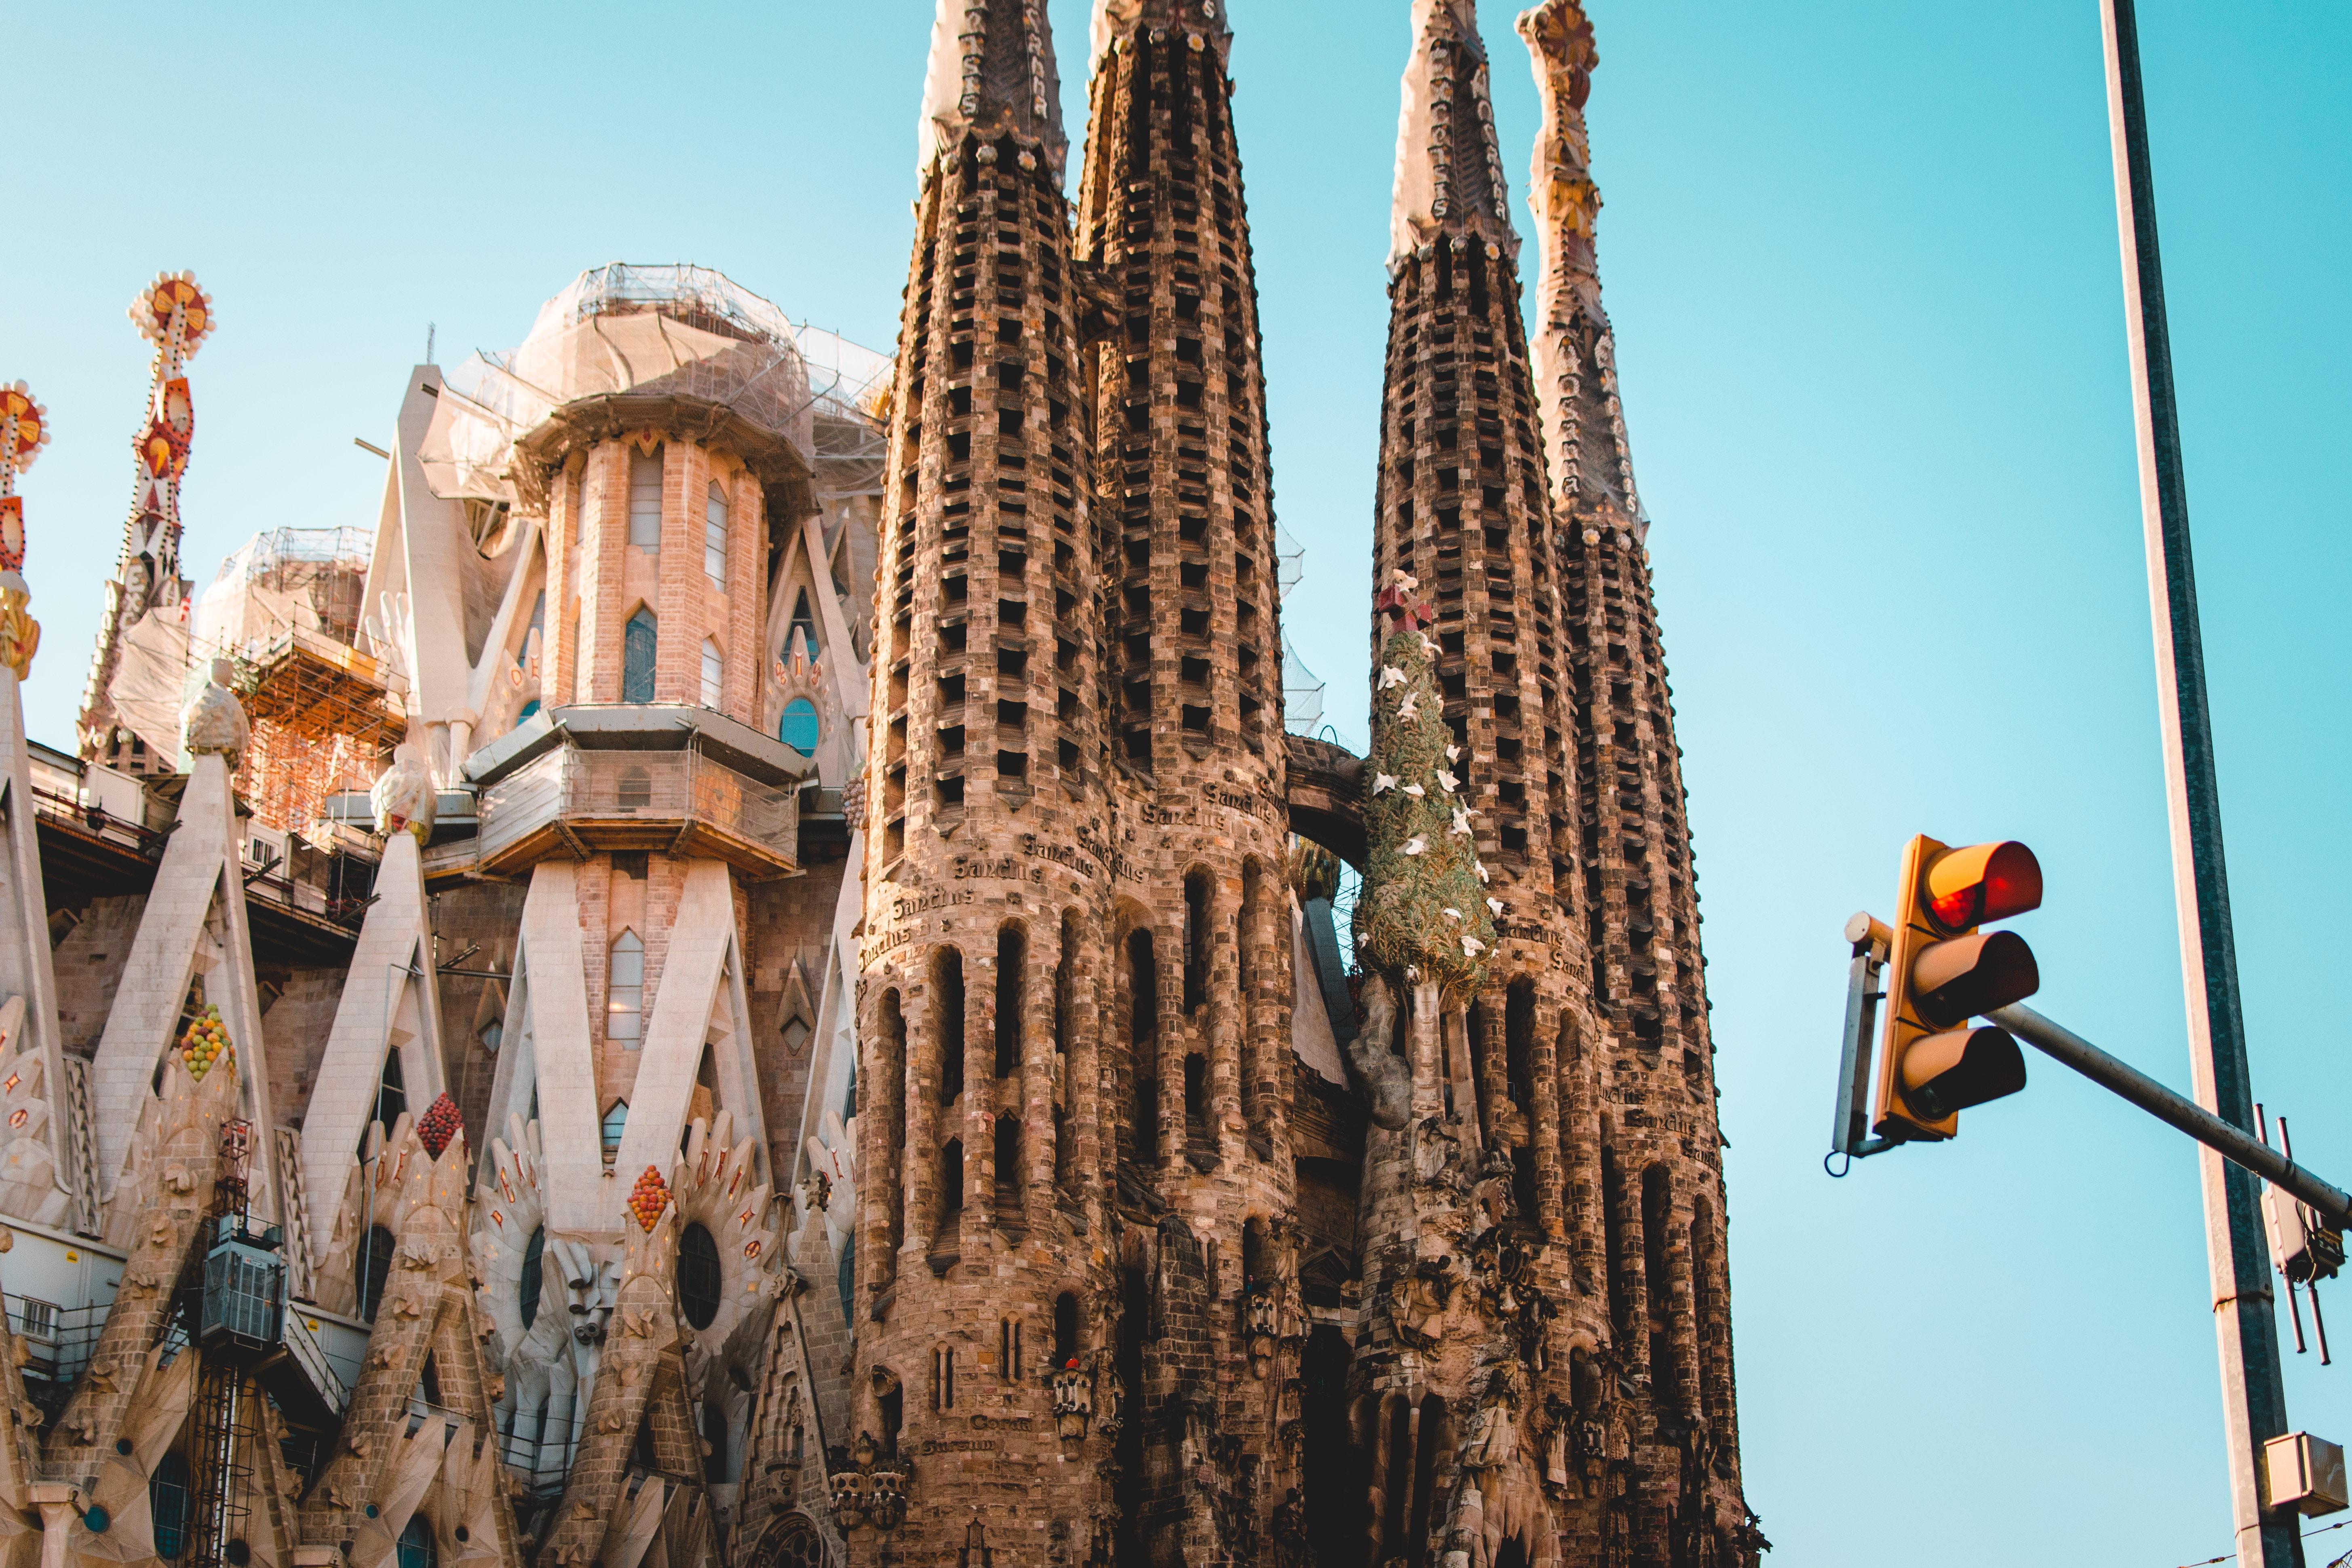 Why Antoni Gaudí's Sagrada Família Still Isn't Finished after 136